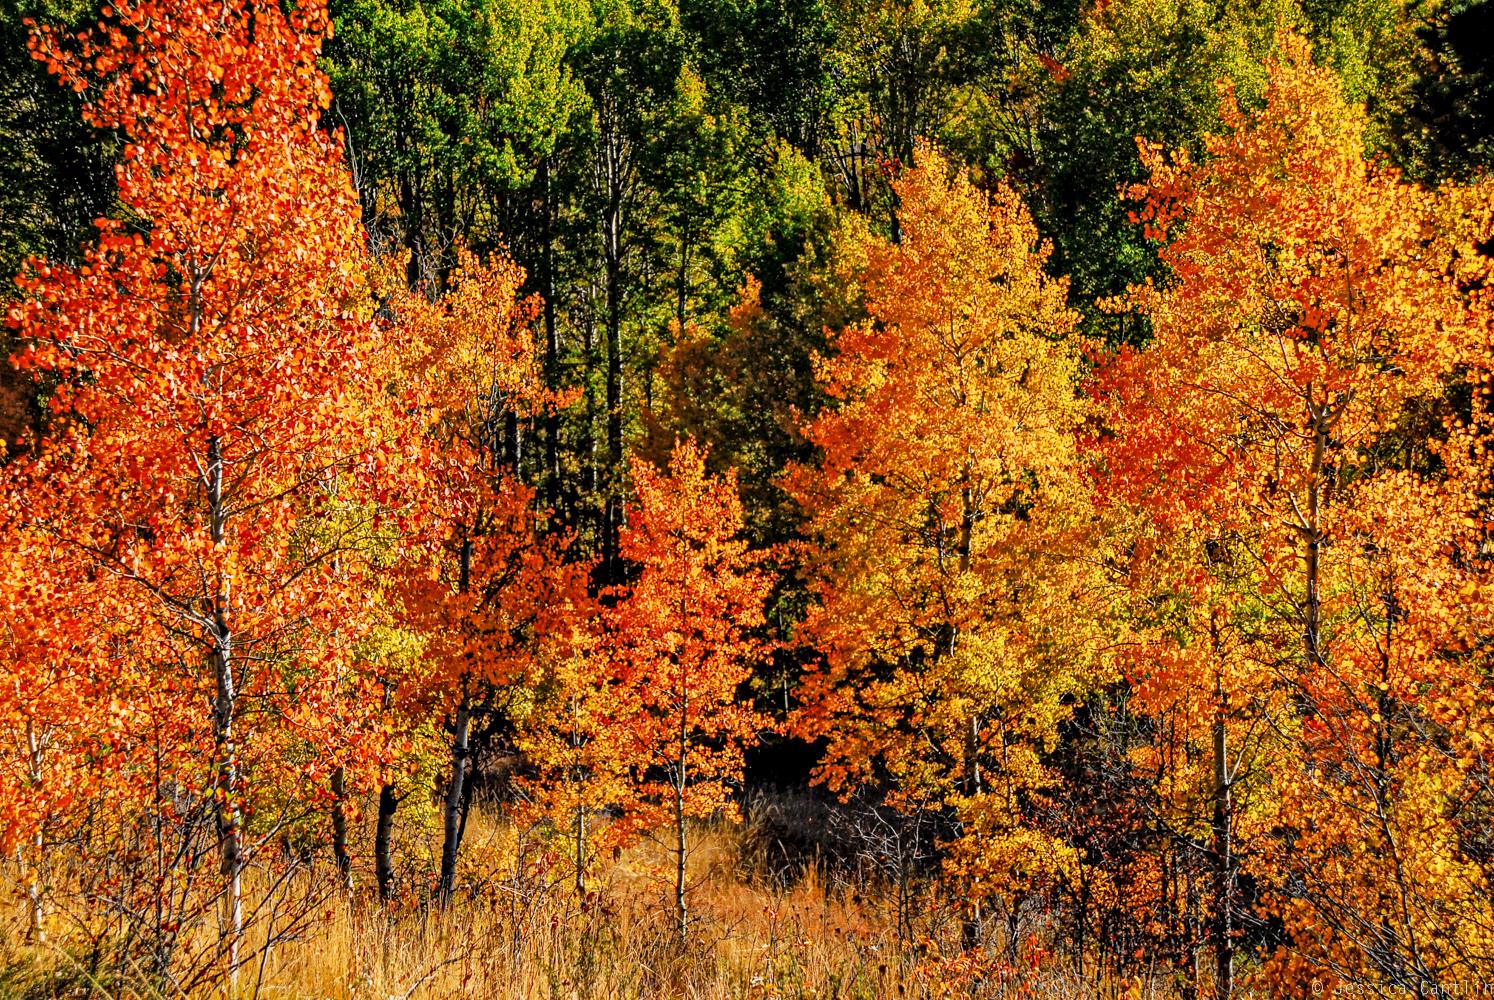 Fall Foliage near Winthrop